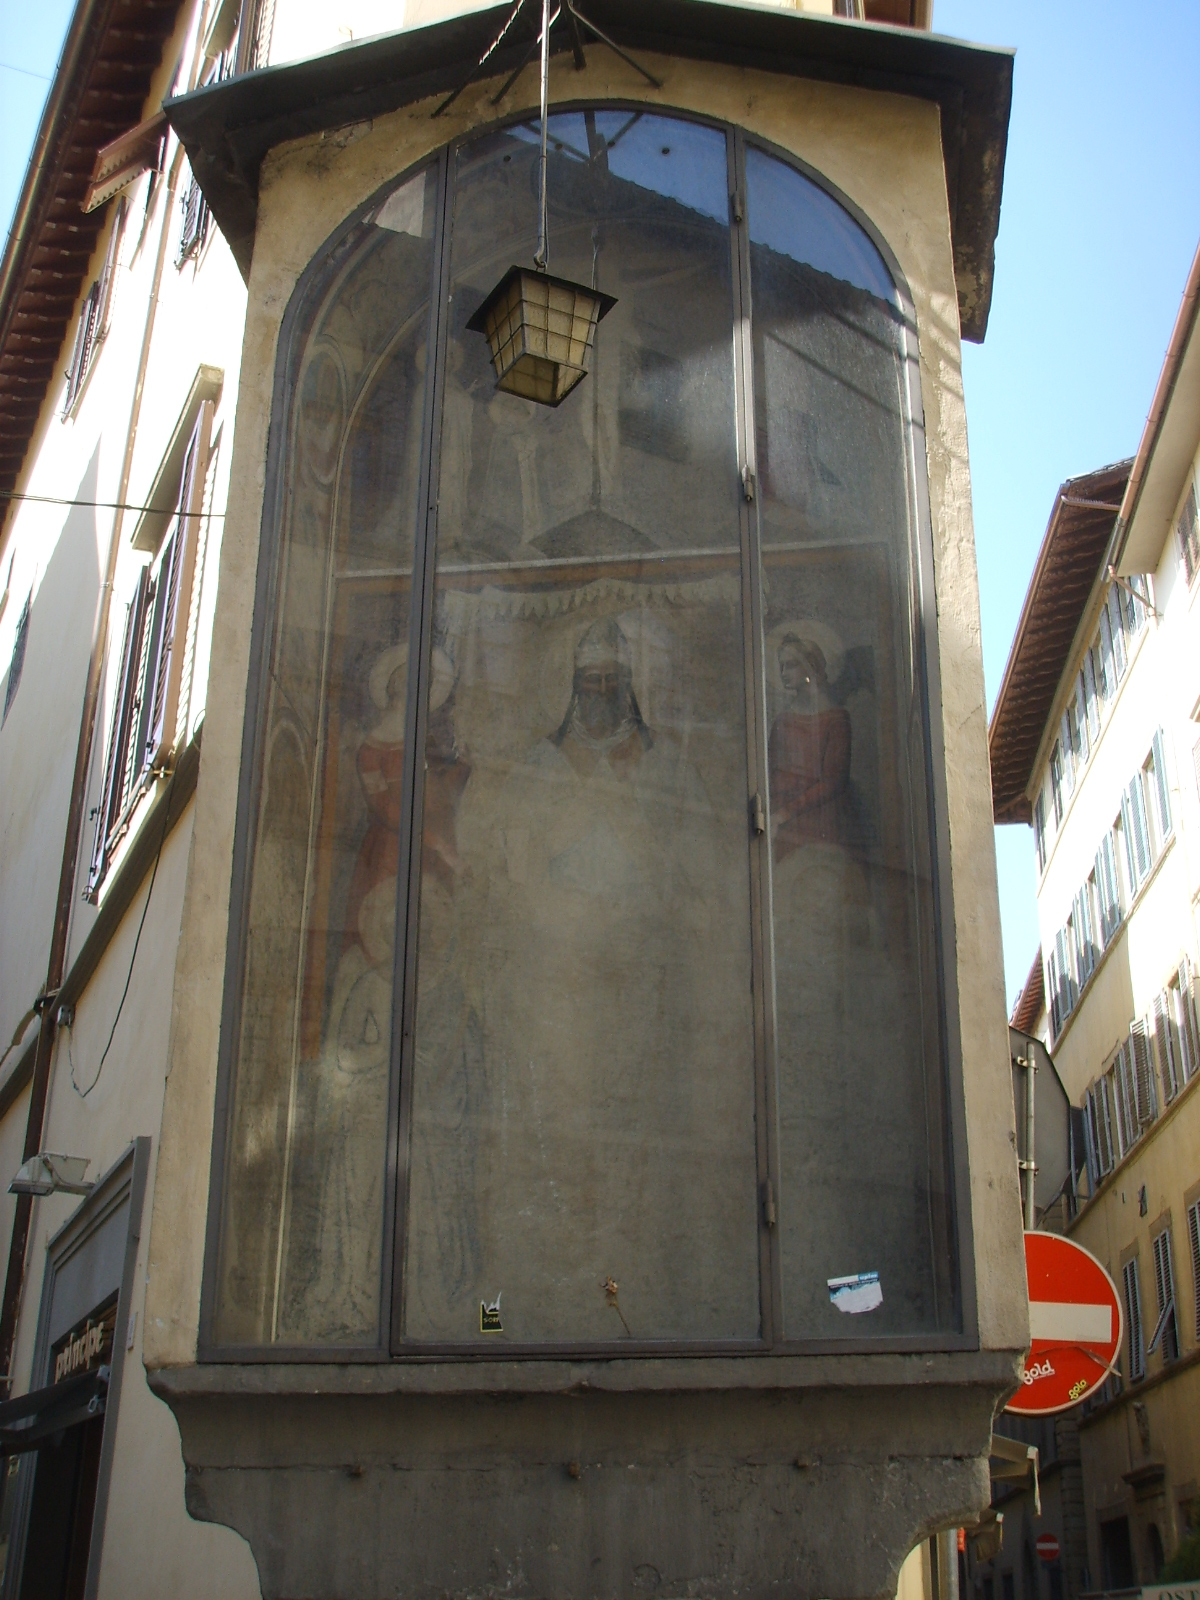 Romi rain xander corvus shower